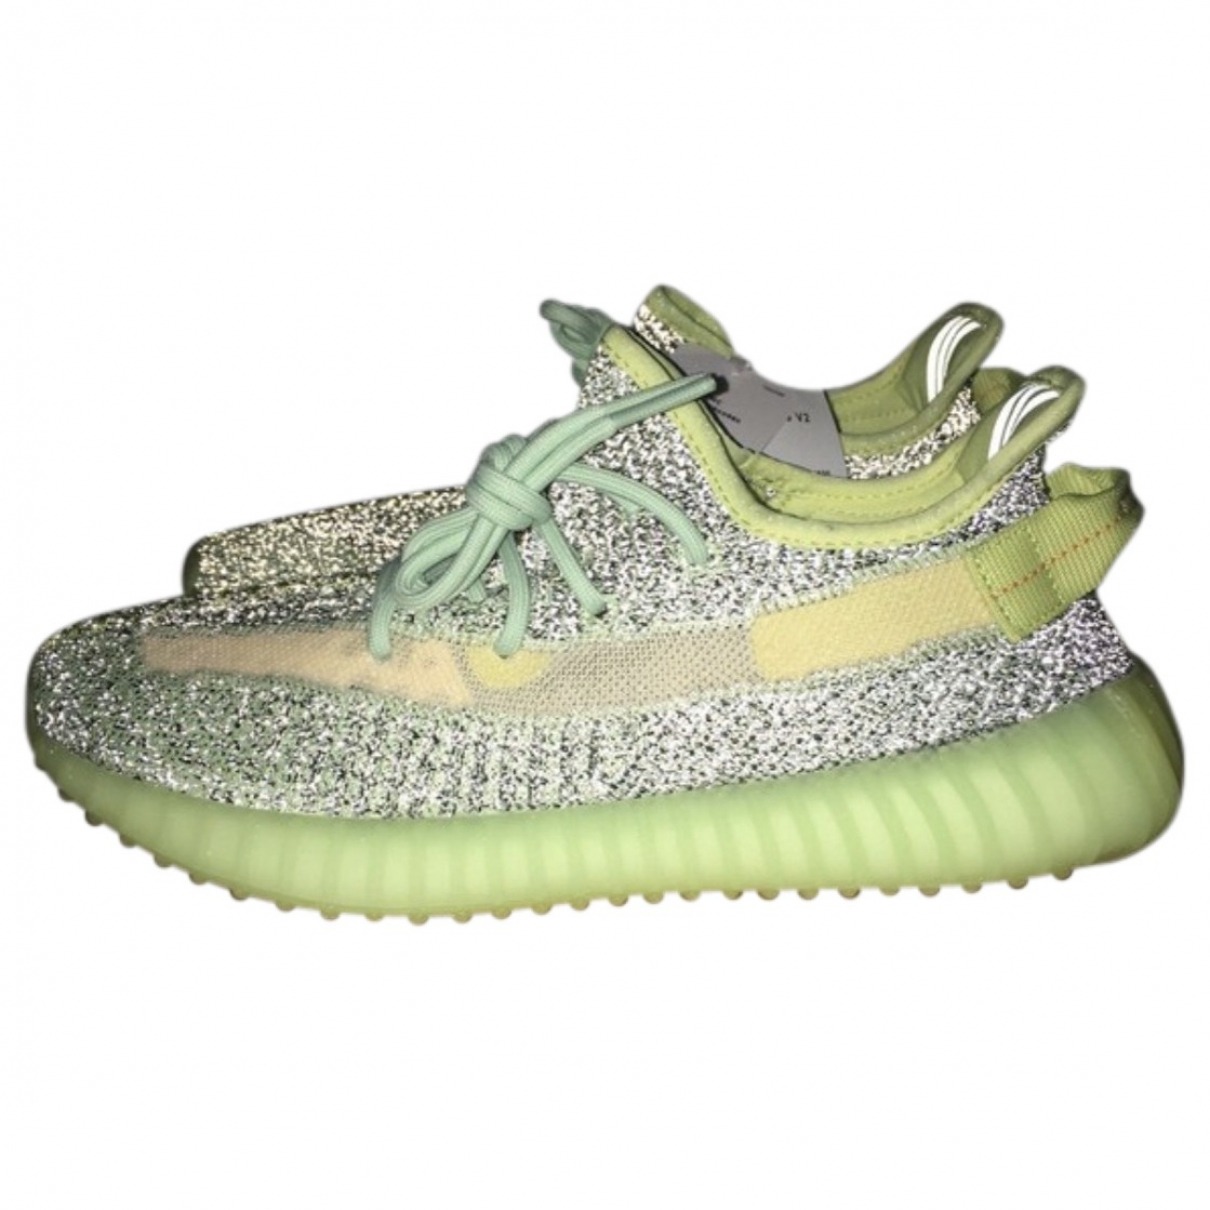 Yeezy X Adidas - Baskets Boost 350 V2 pour homme en toile - vert